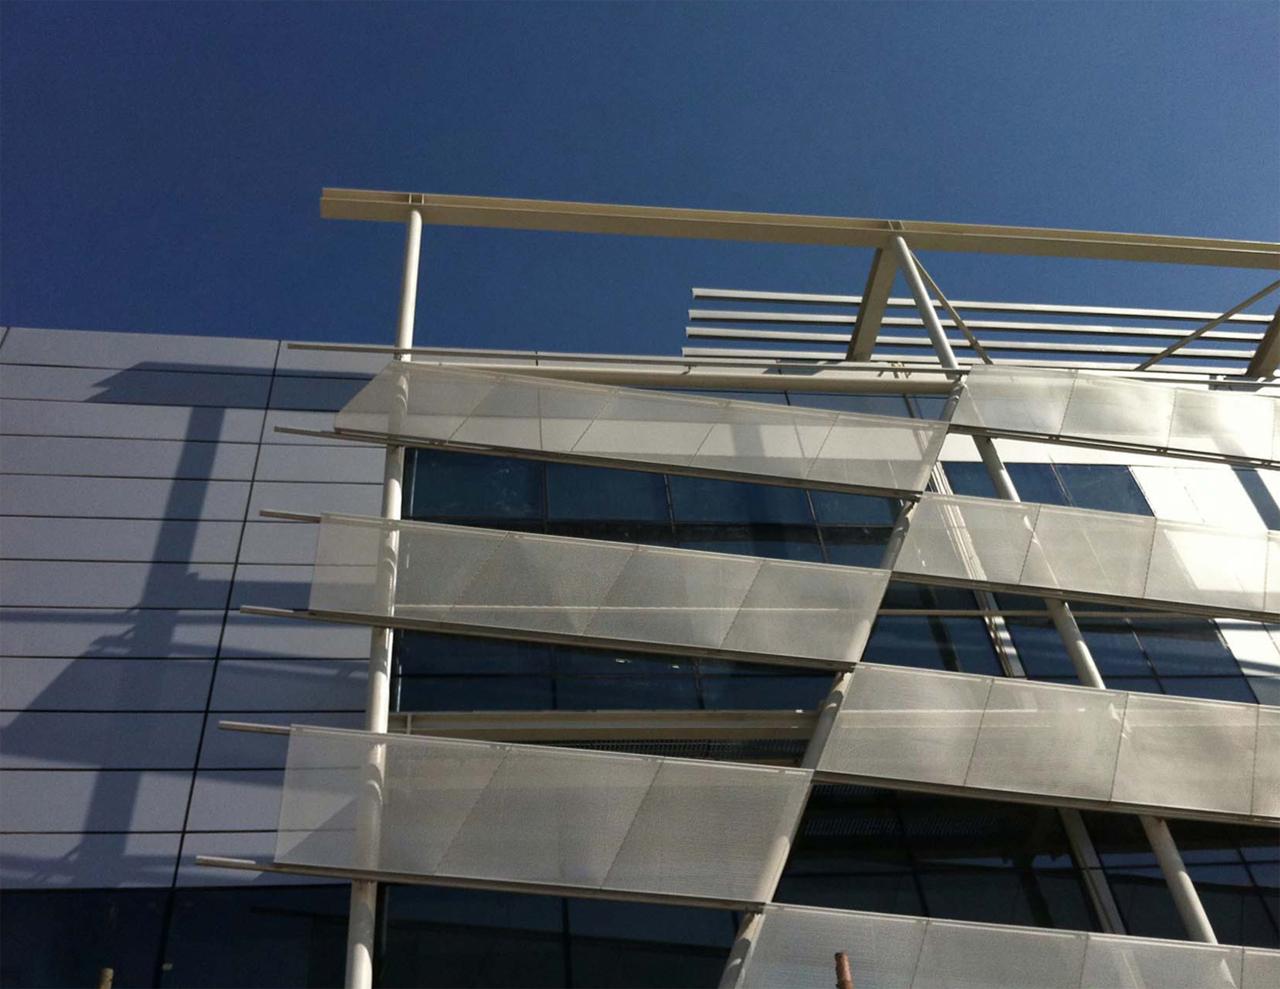 Mafraq Dialysis Center / Stantec